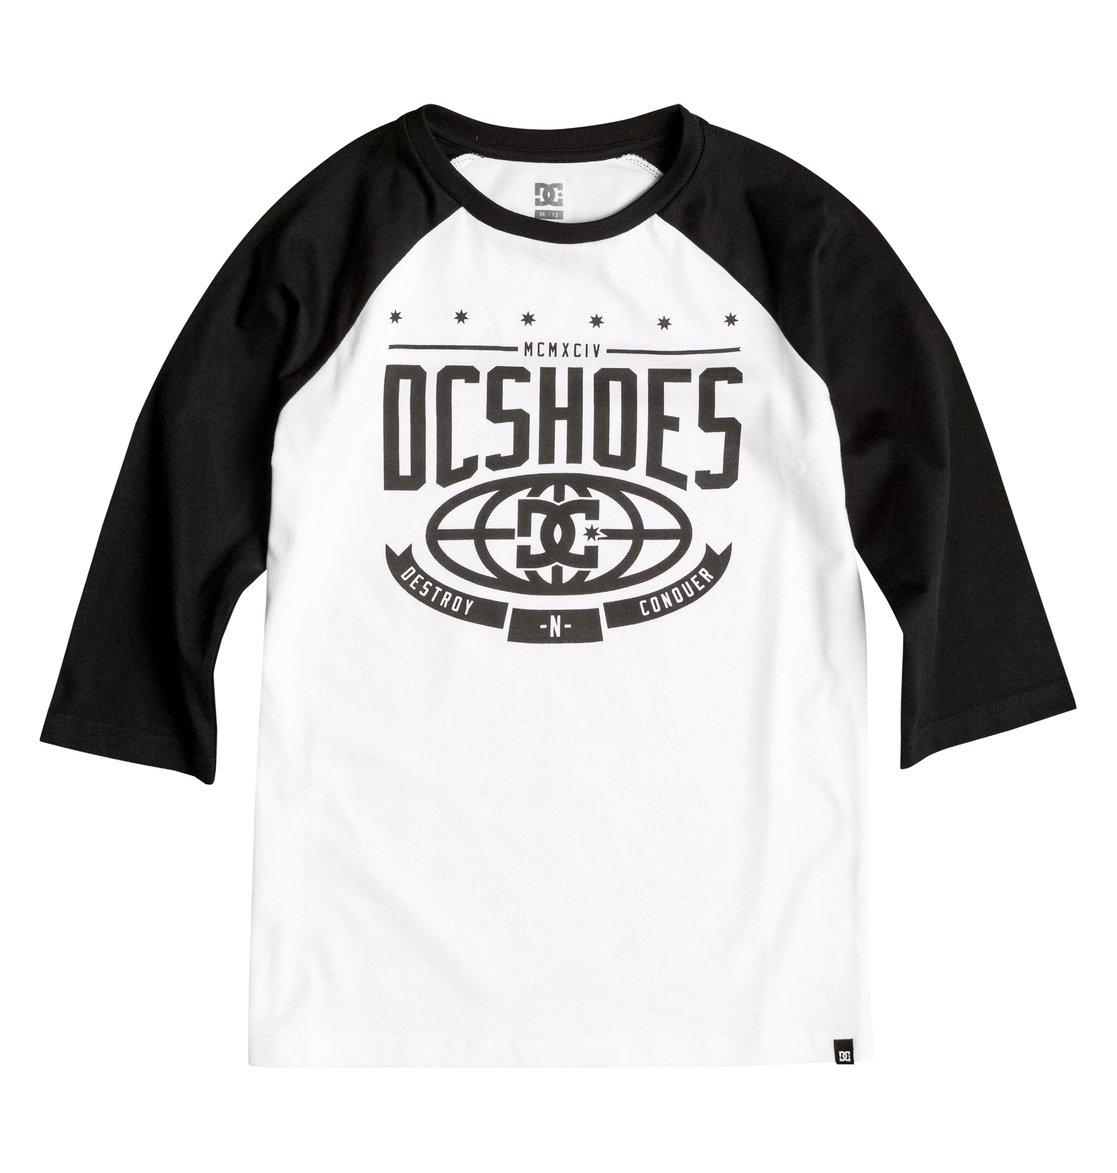 The Creed Raglan T-ShirtФутболка-реглан для мальчиков The Creed от DC Shoes. <br>ХАРАКТЕРИСТИКИ: стандартный крой, рукава-реглан, мягкий графический принт. <br>СОСТАВ: 100% хлопок.<br>